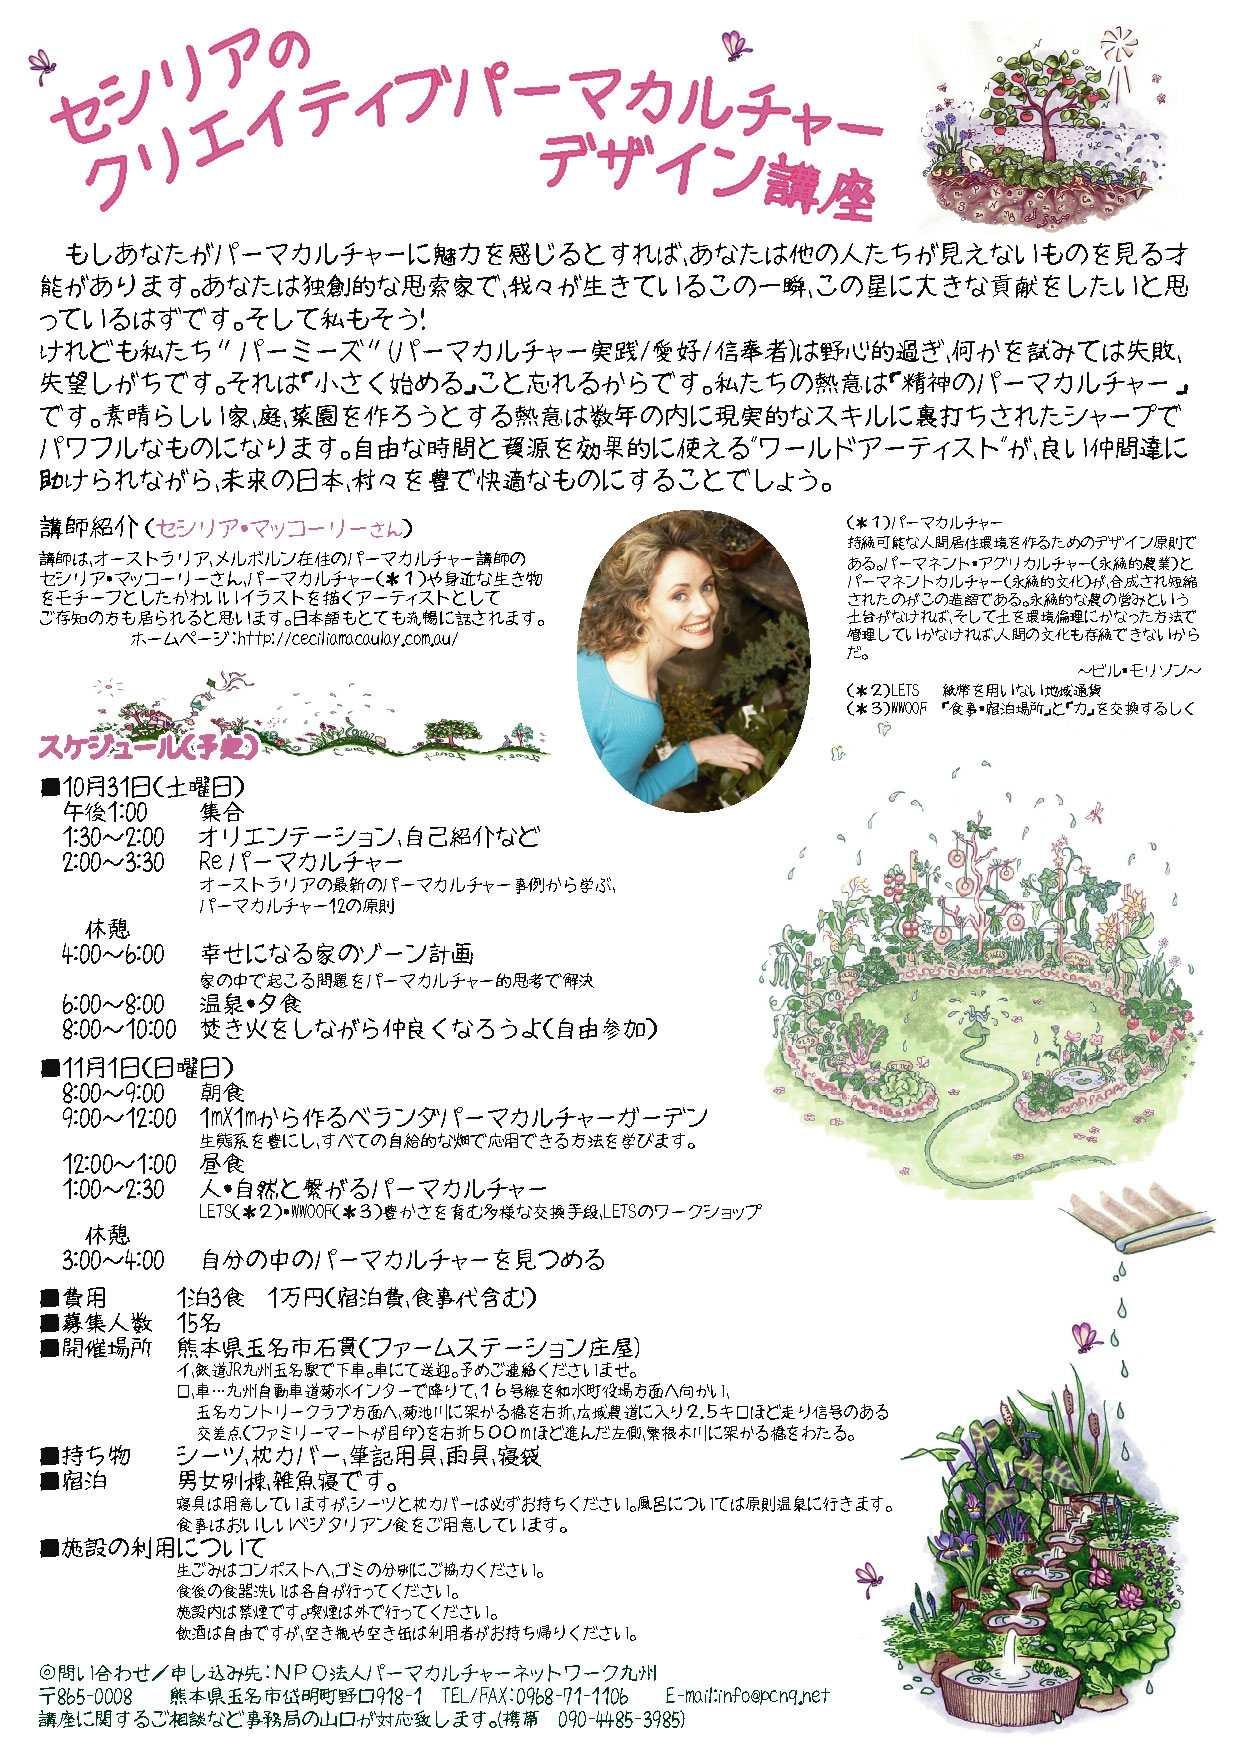 cecilias kyushu seminar